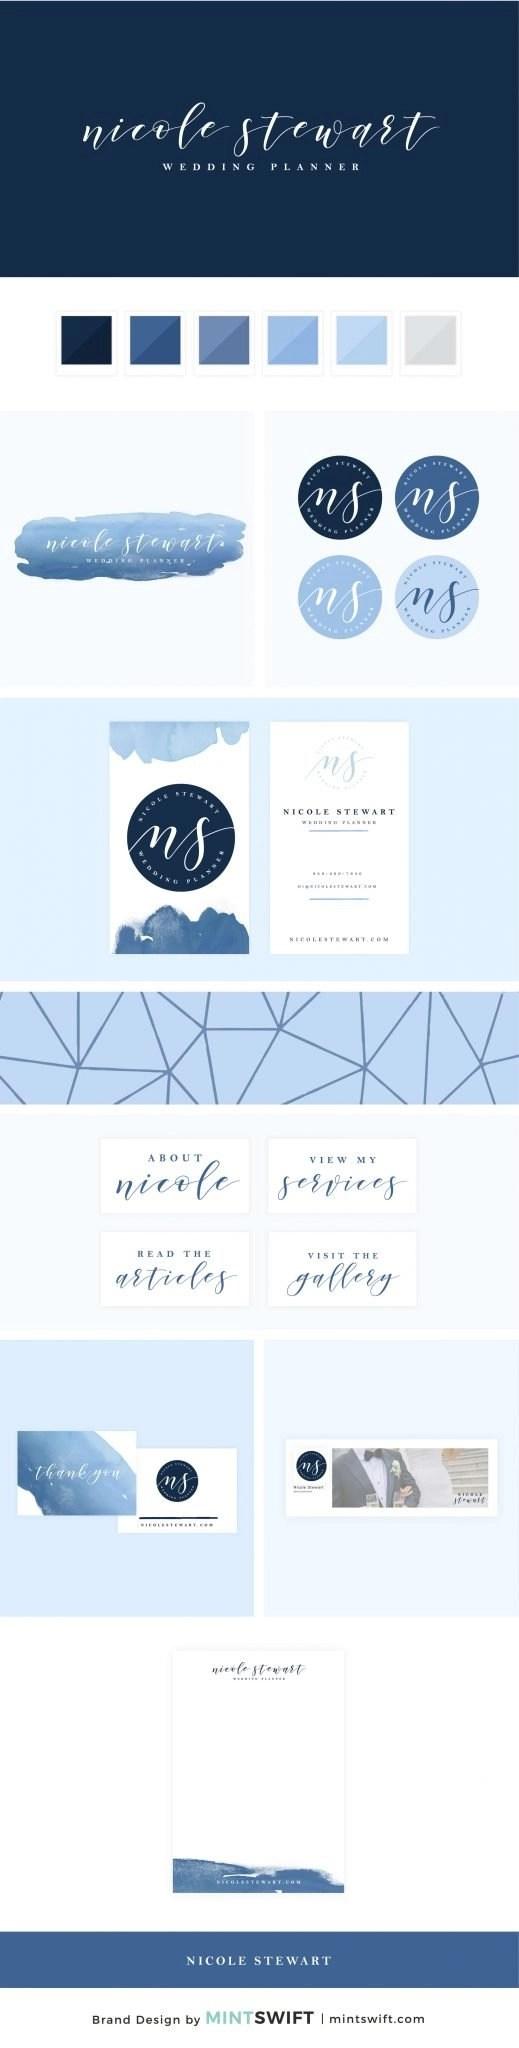 Nicole Stewart - Brand Design Package - MintSwift